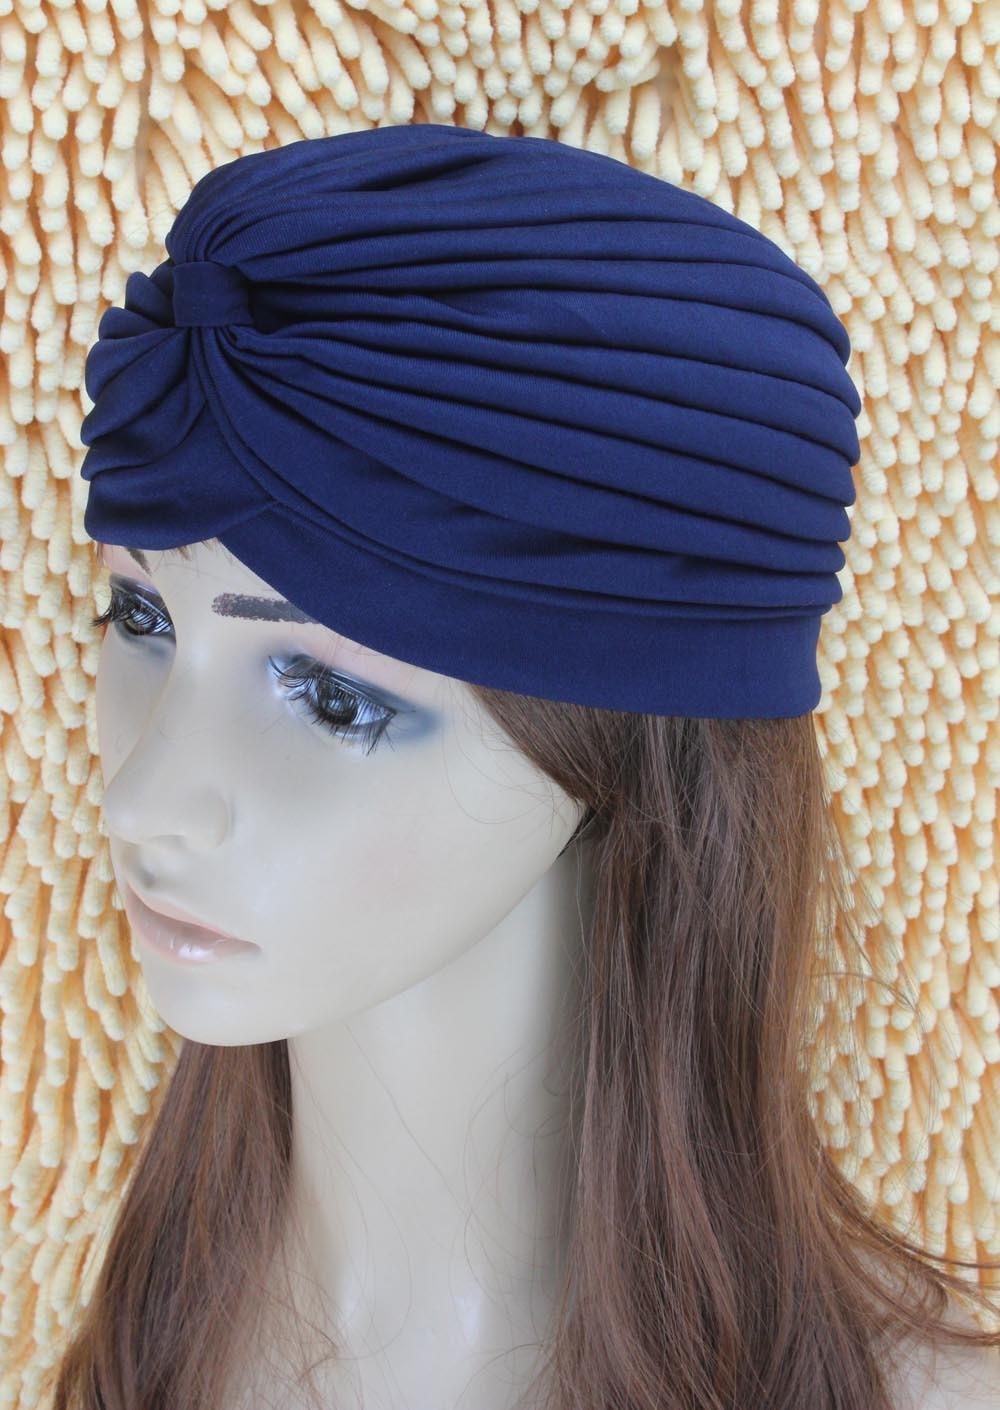 Mode Indian Unisex Head Wrap Cap vrouwen tulband Bandana indian caps - Kledingaccessoires - Foto 5